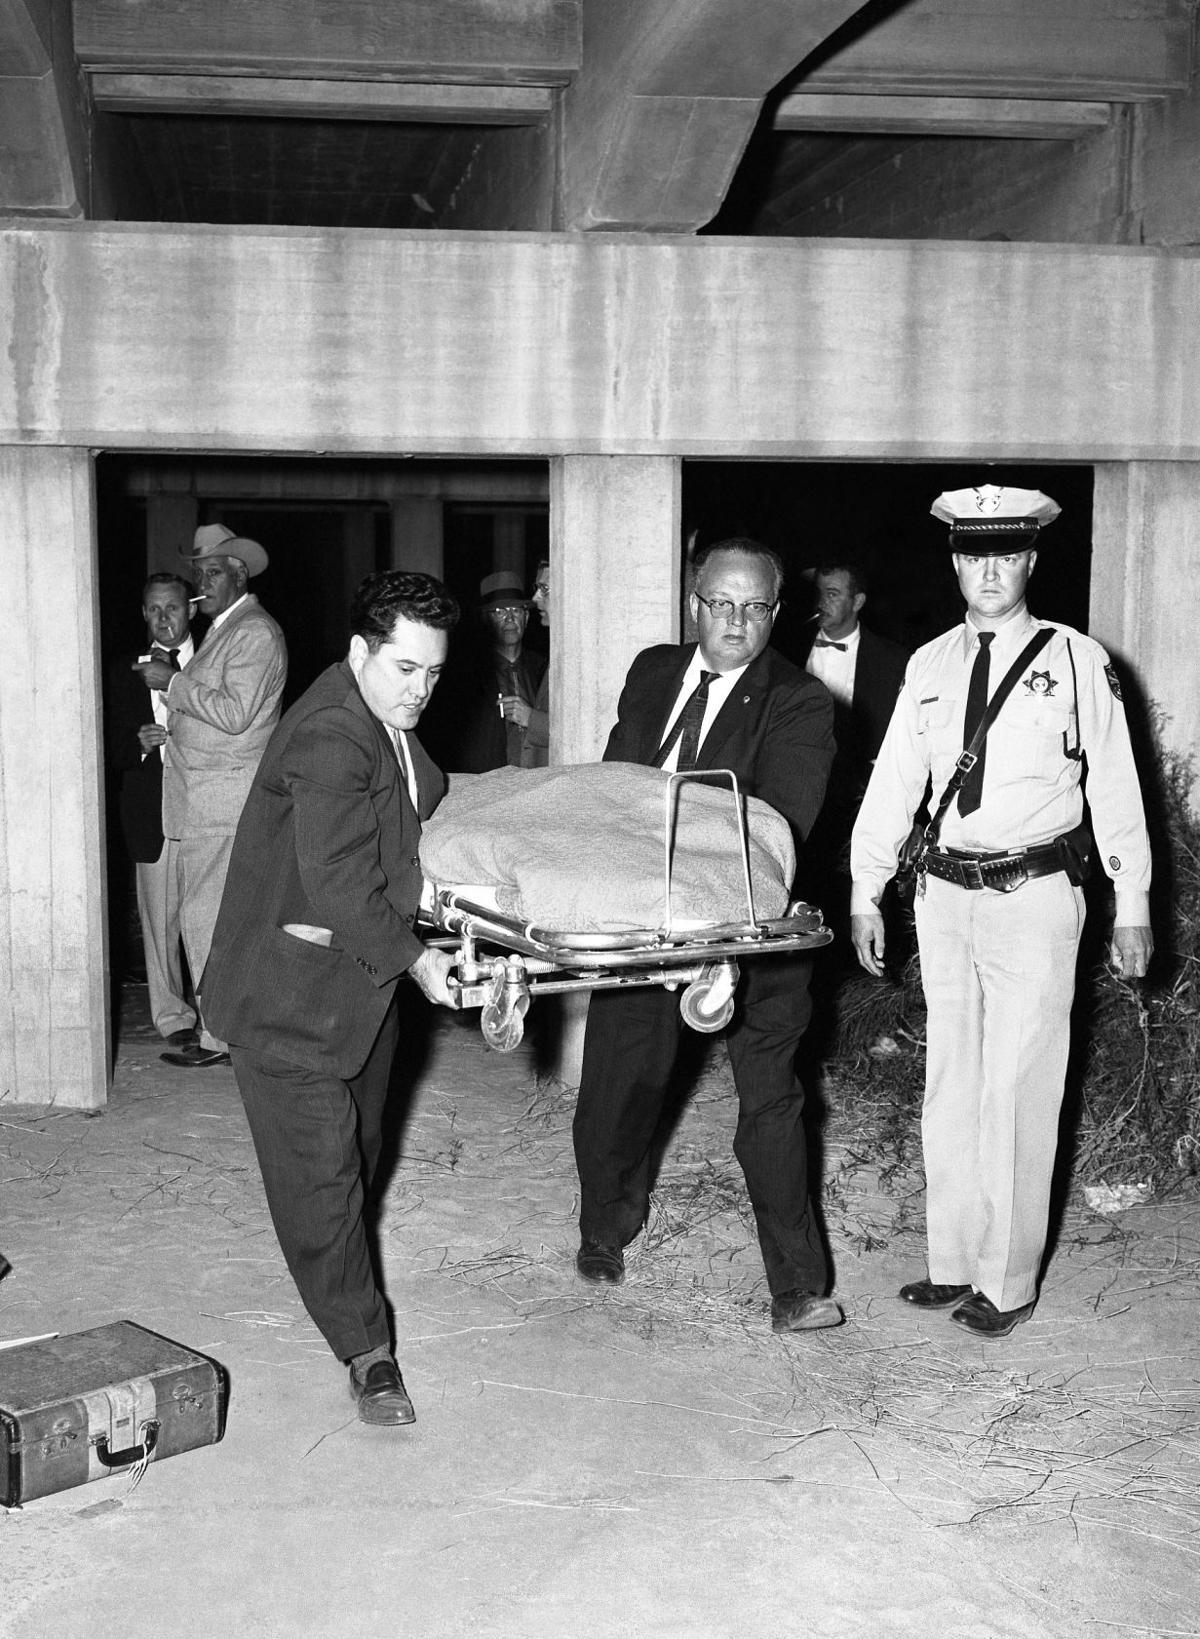 Murder of Marguerita Bejarano in 1961